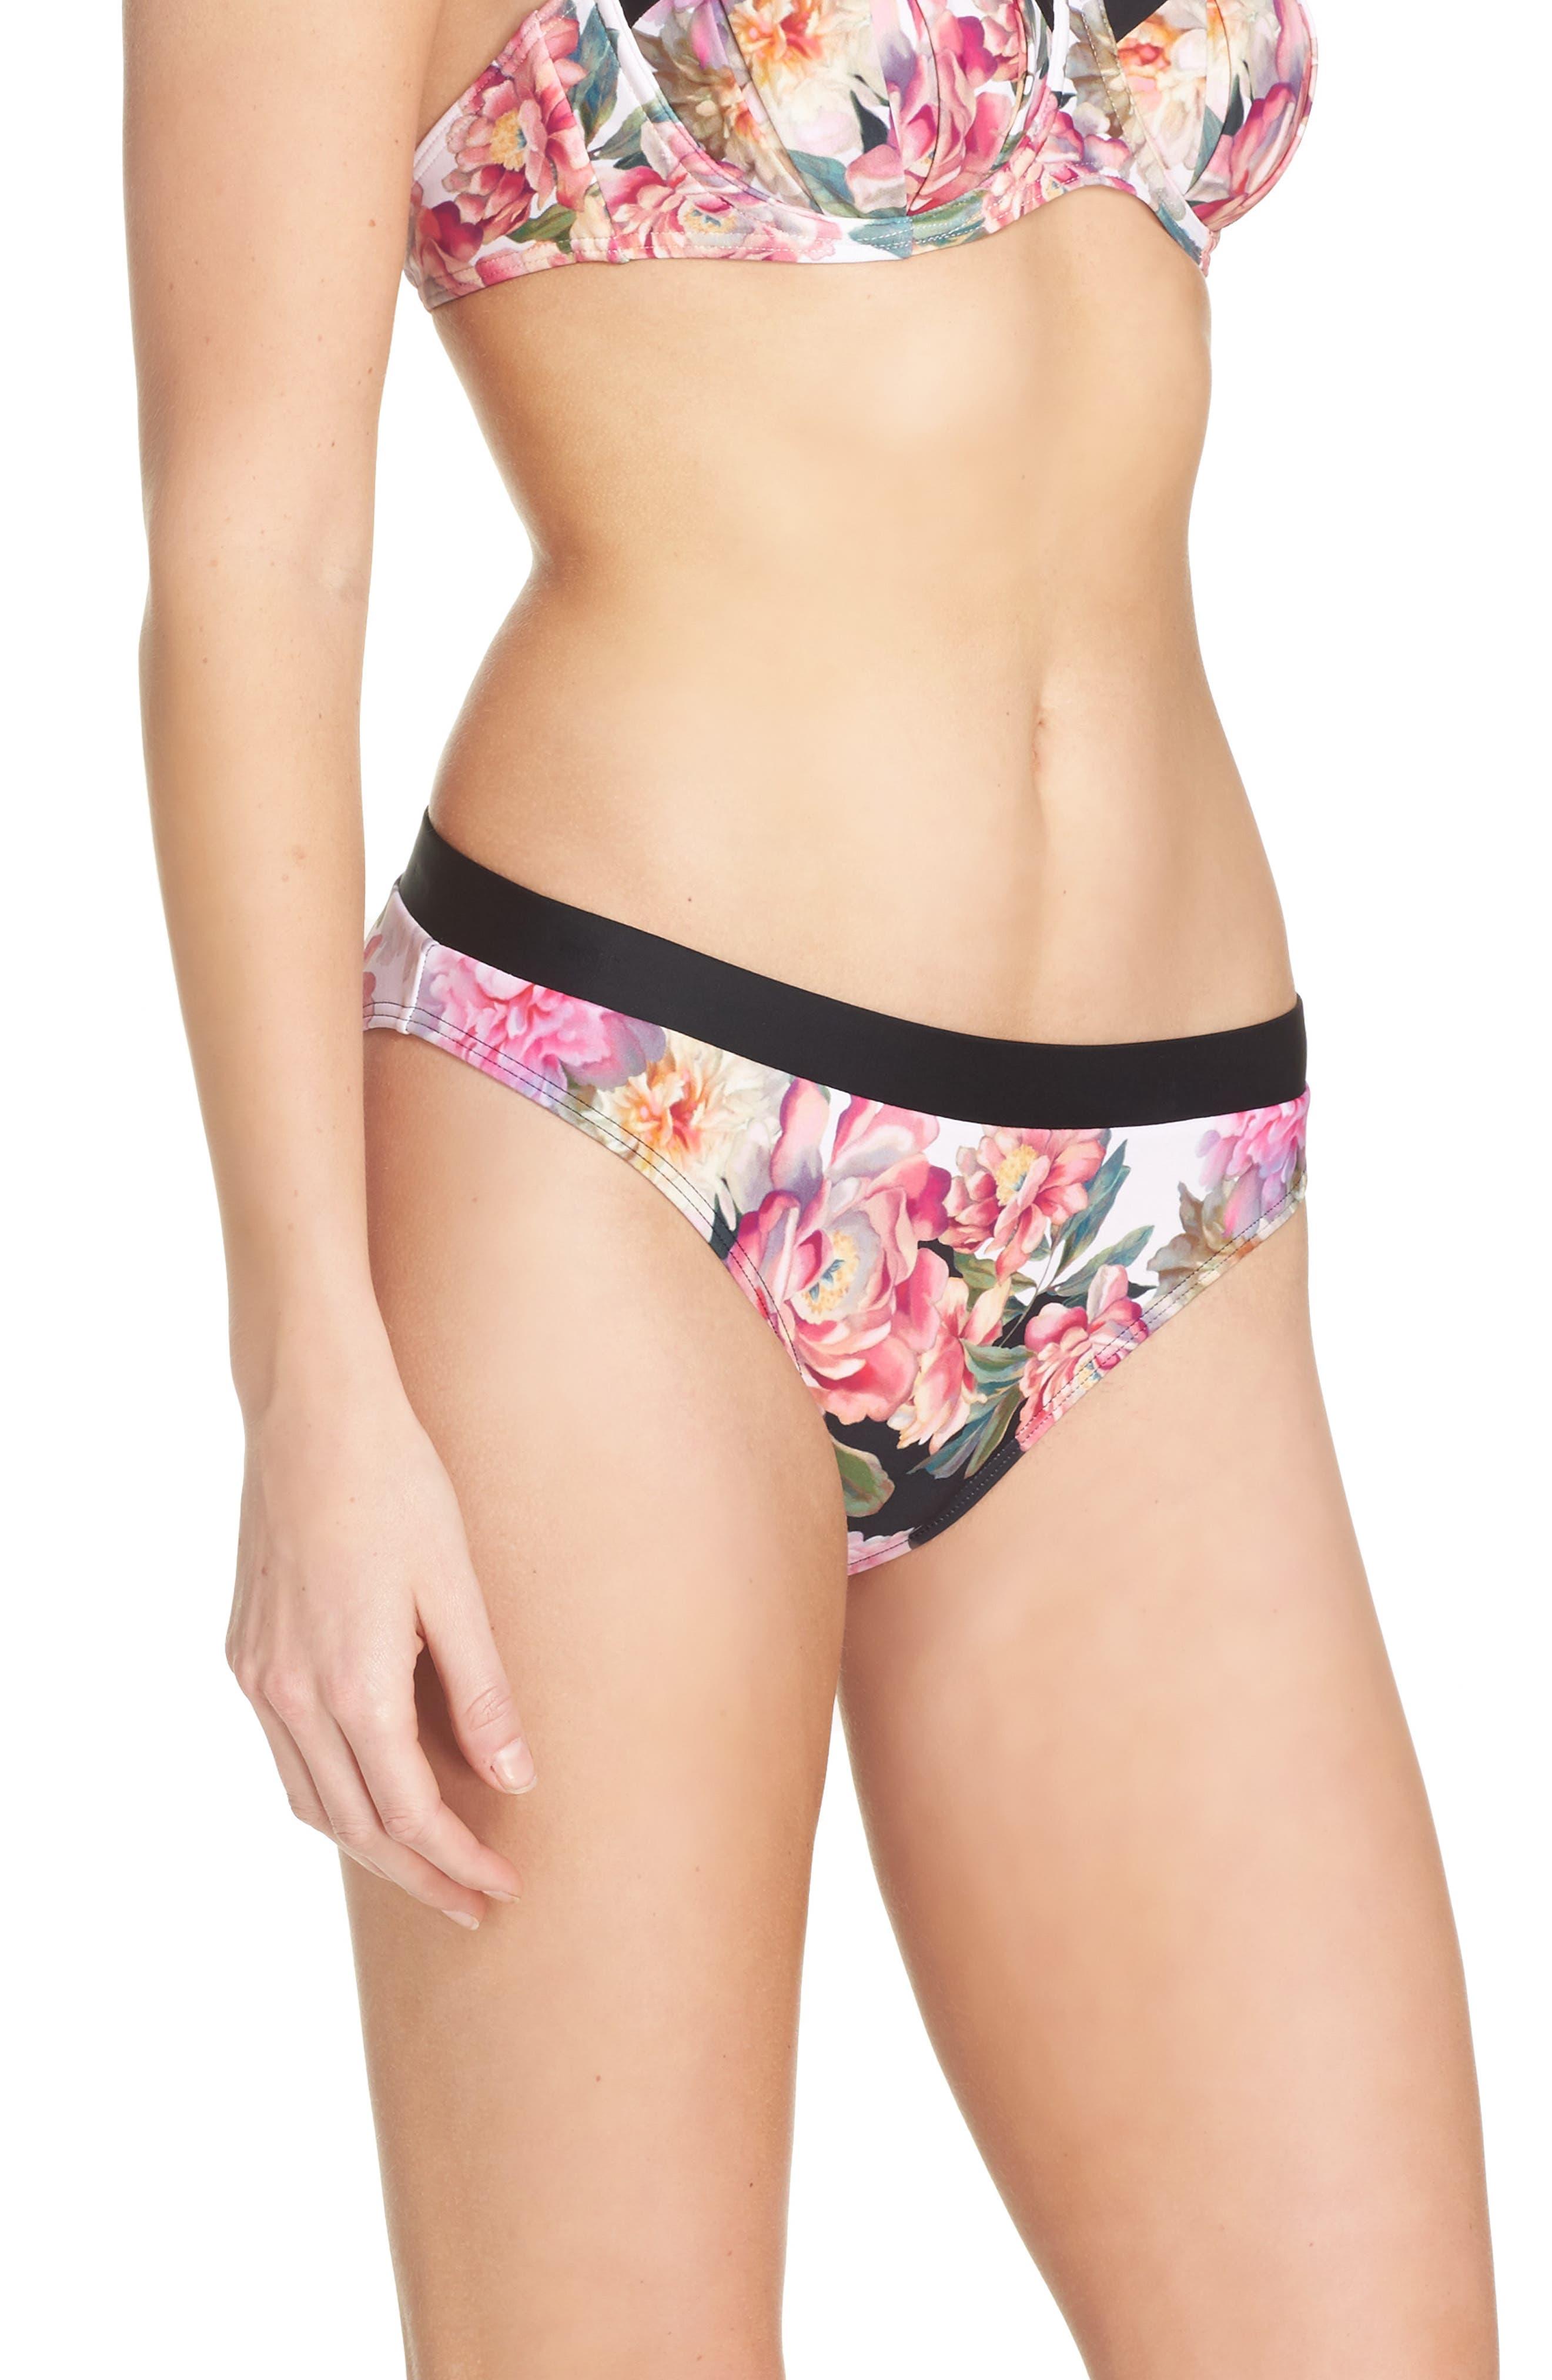 Painted Posie Bikini Bottoms,                             Alternate thumbnail 3, color,                             682